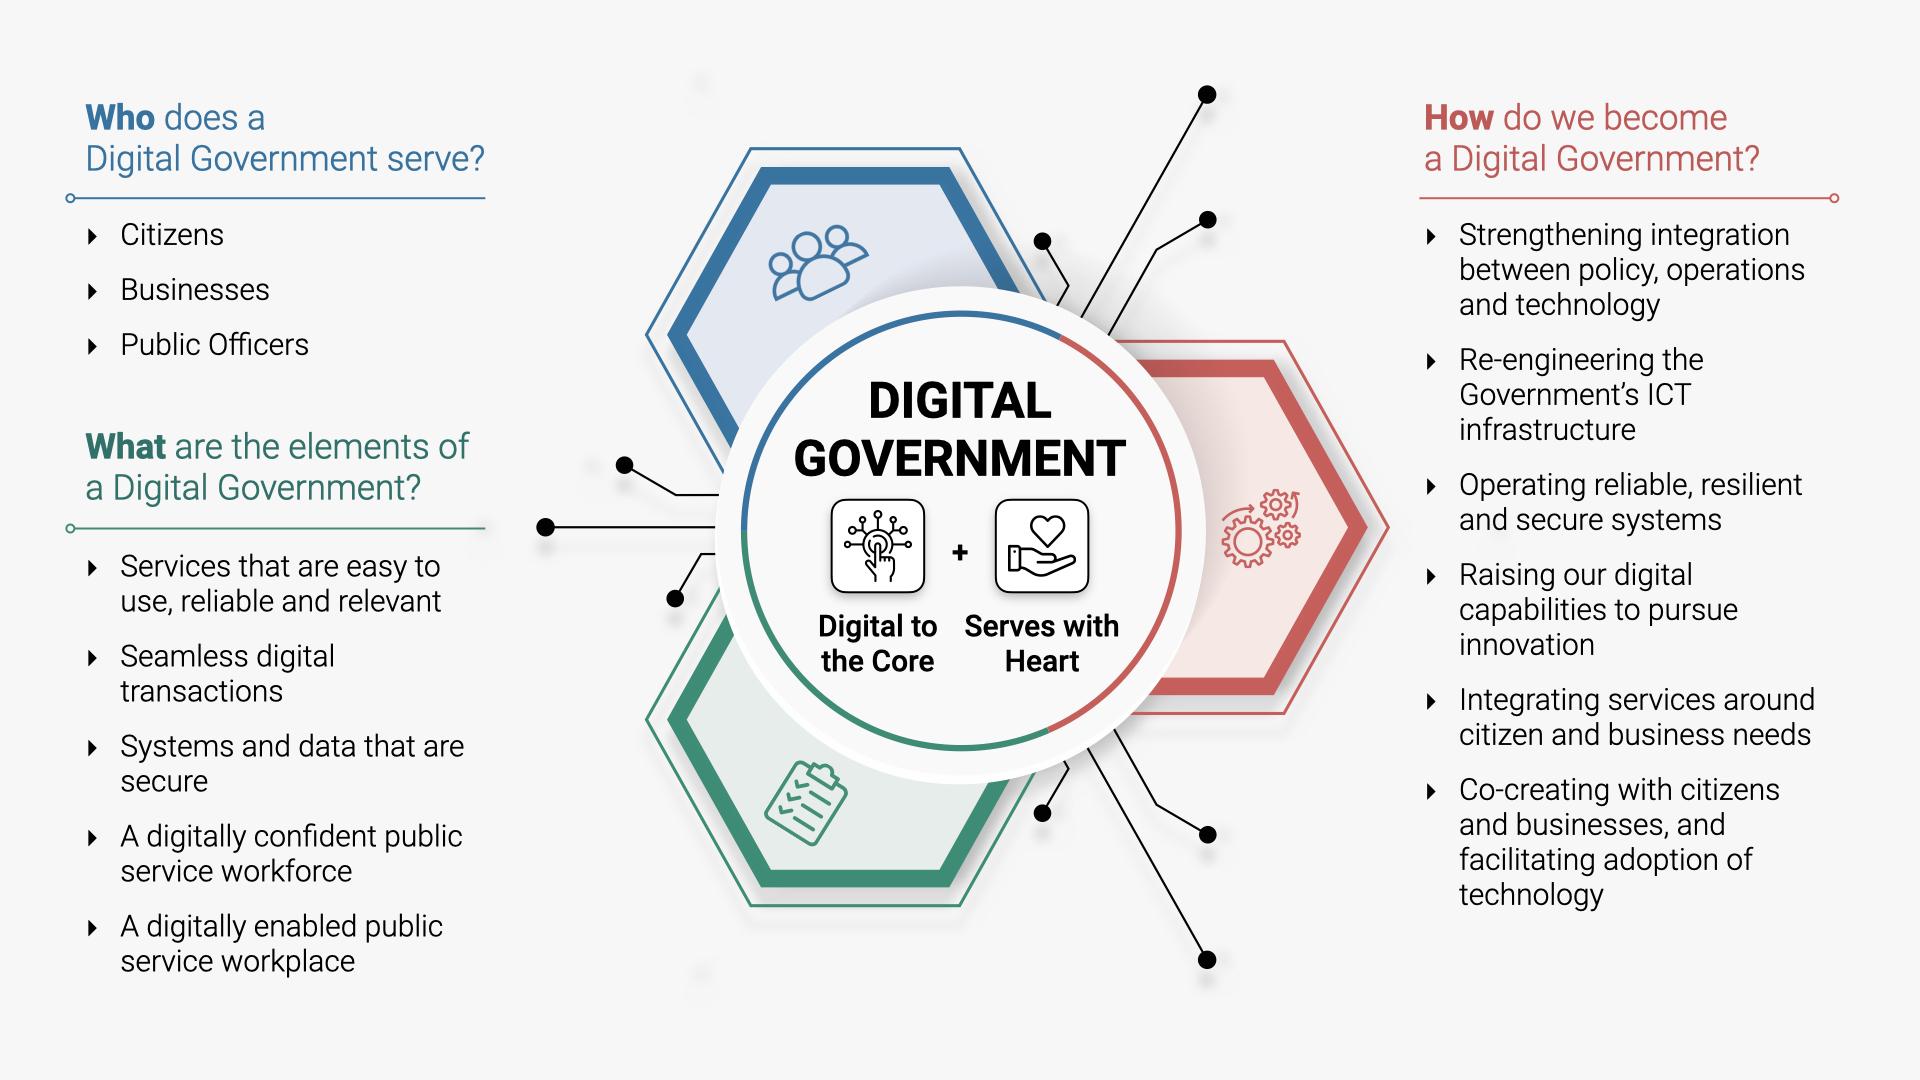 Image of Digital Government Blueprint